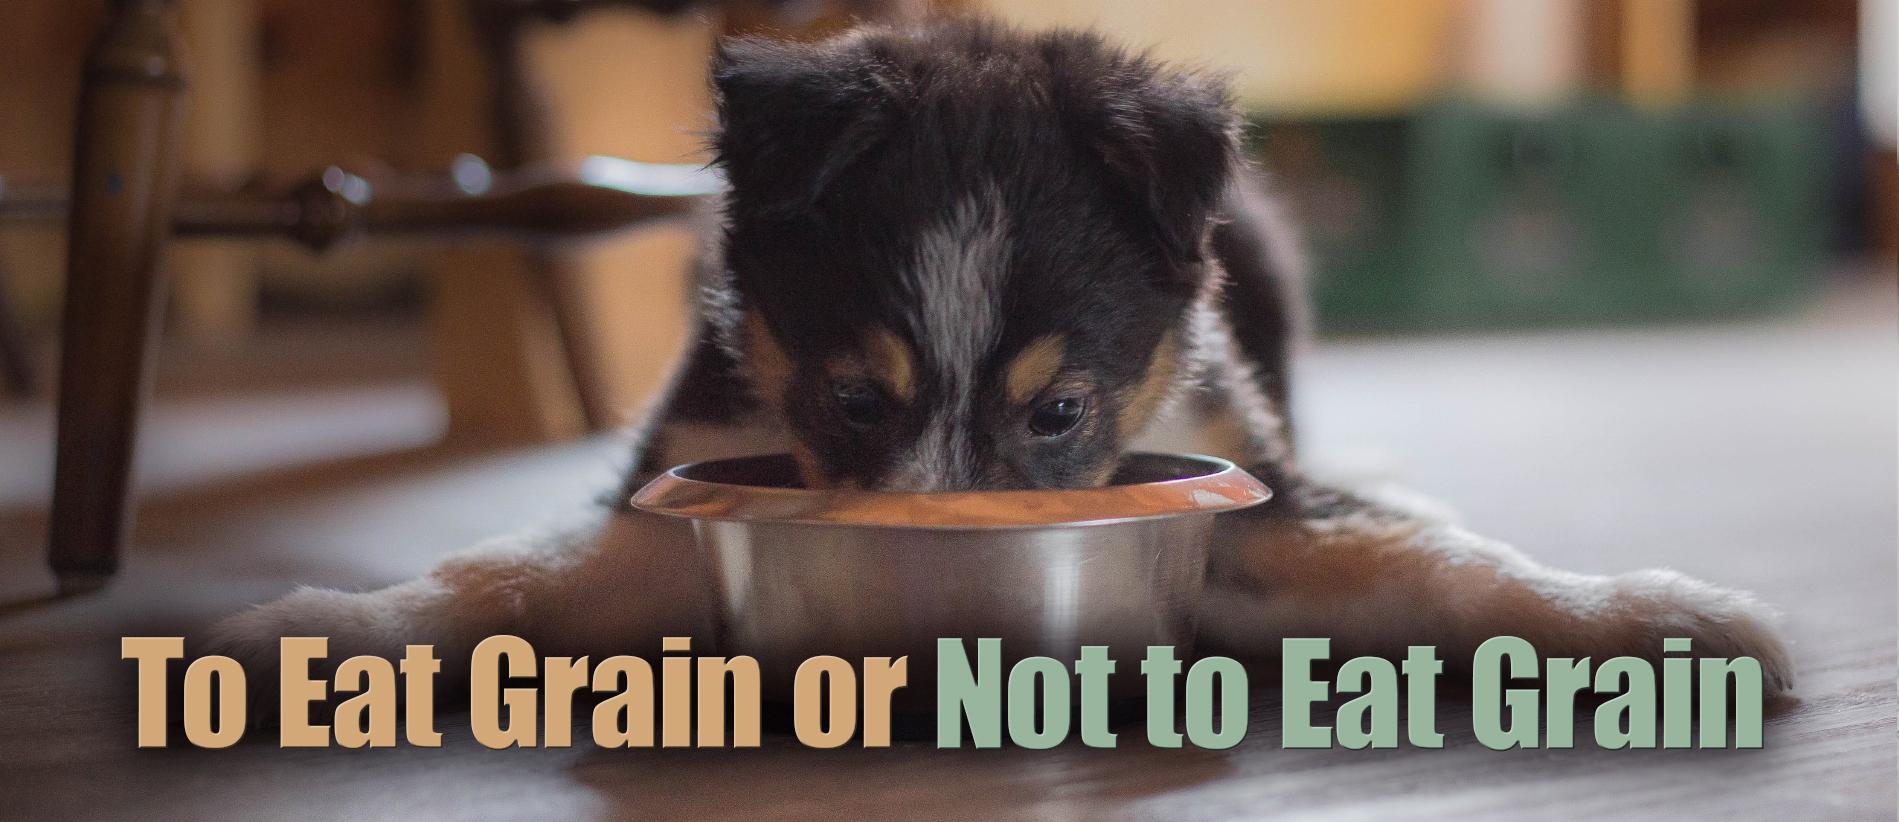 to-eat-grain-hdr-e